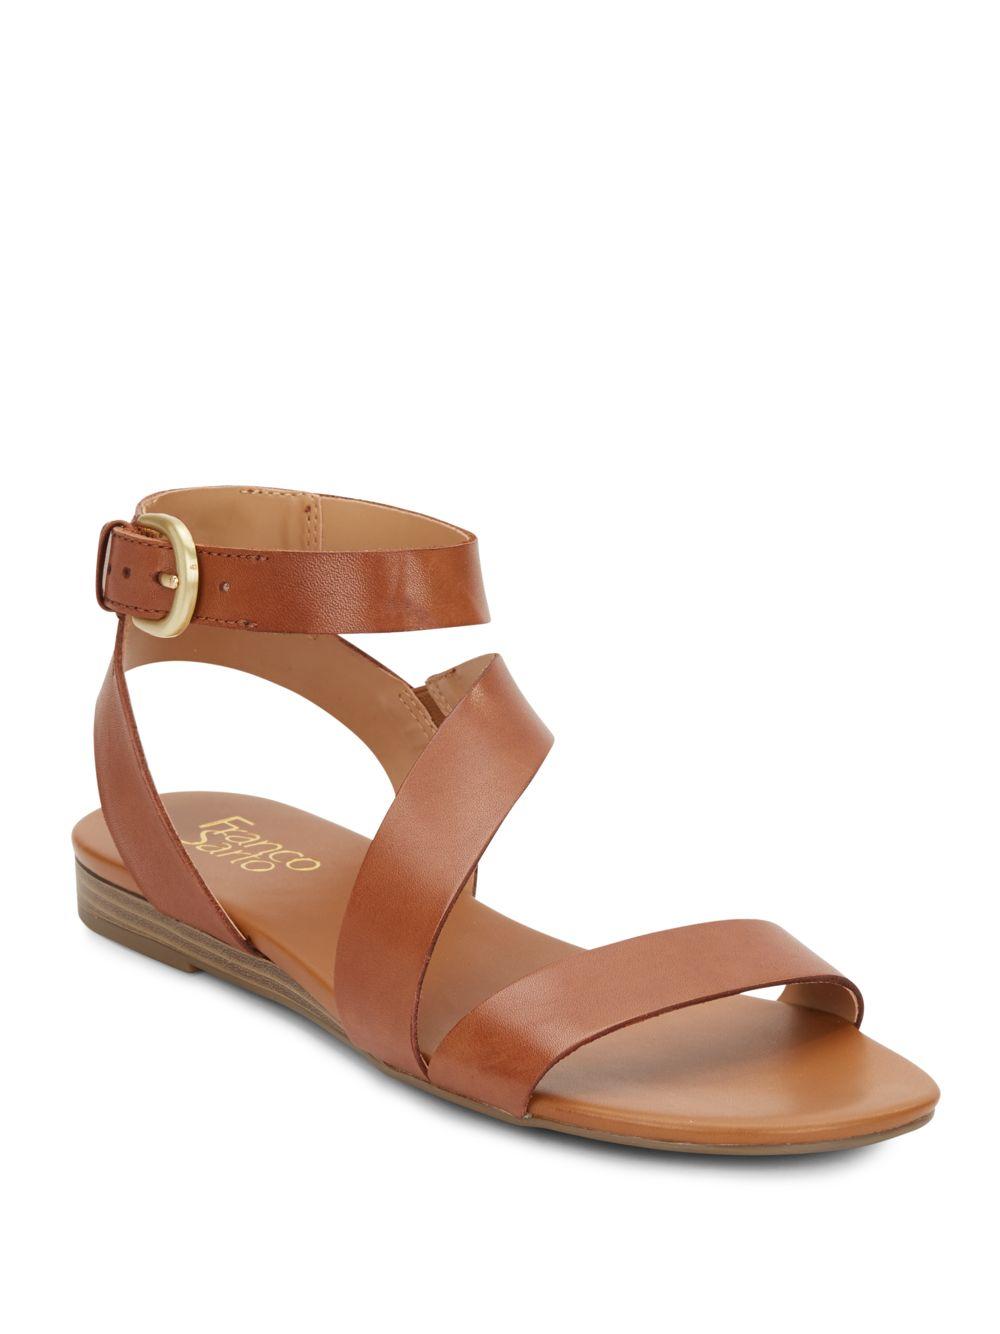 cc4ecd2b71e4 Lyst - Franco Sarto Gustar Leather Sandals in Natural